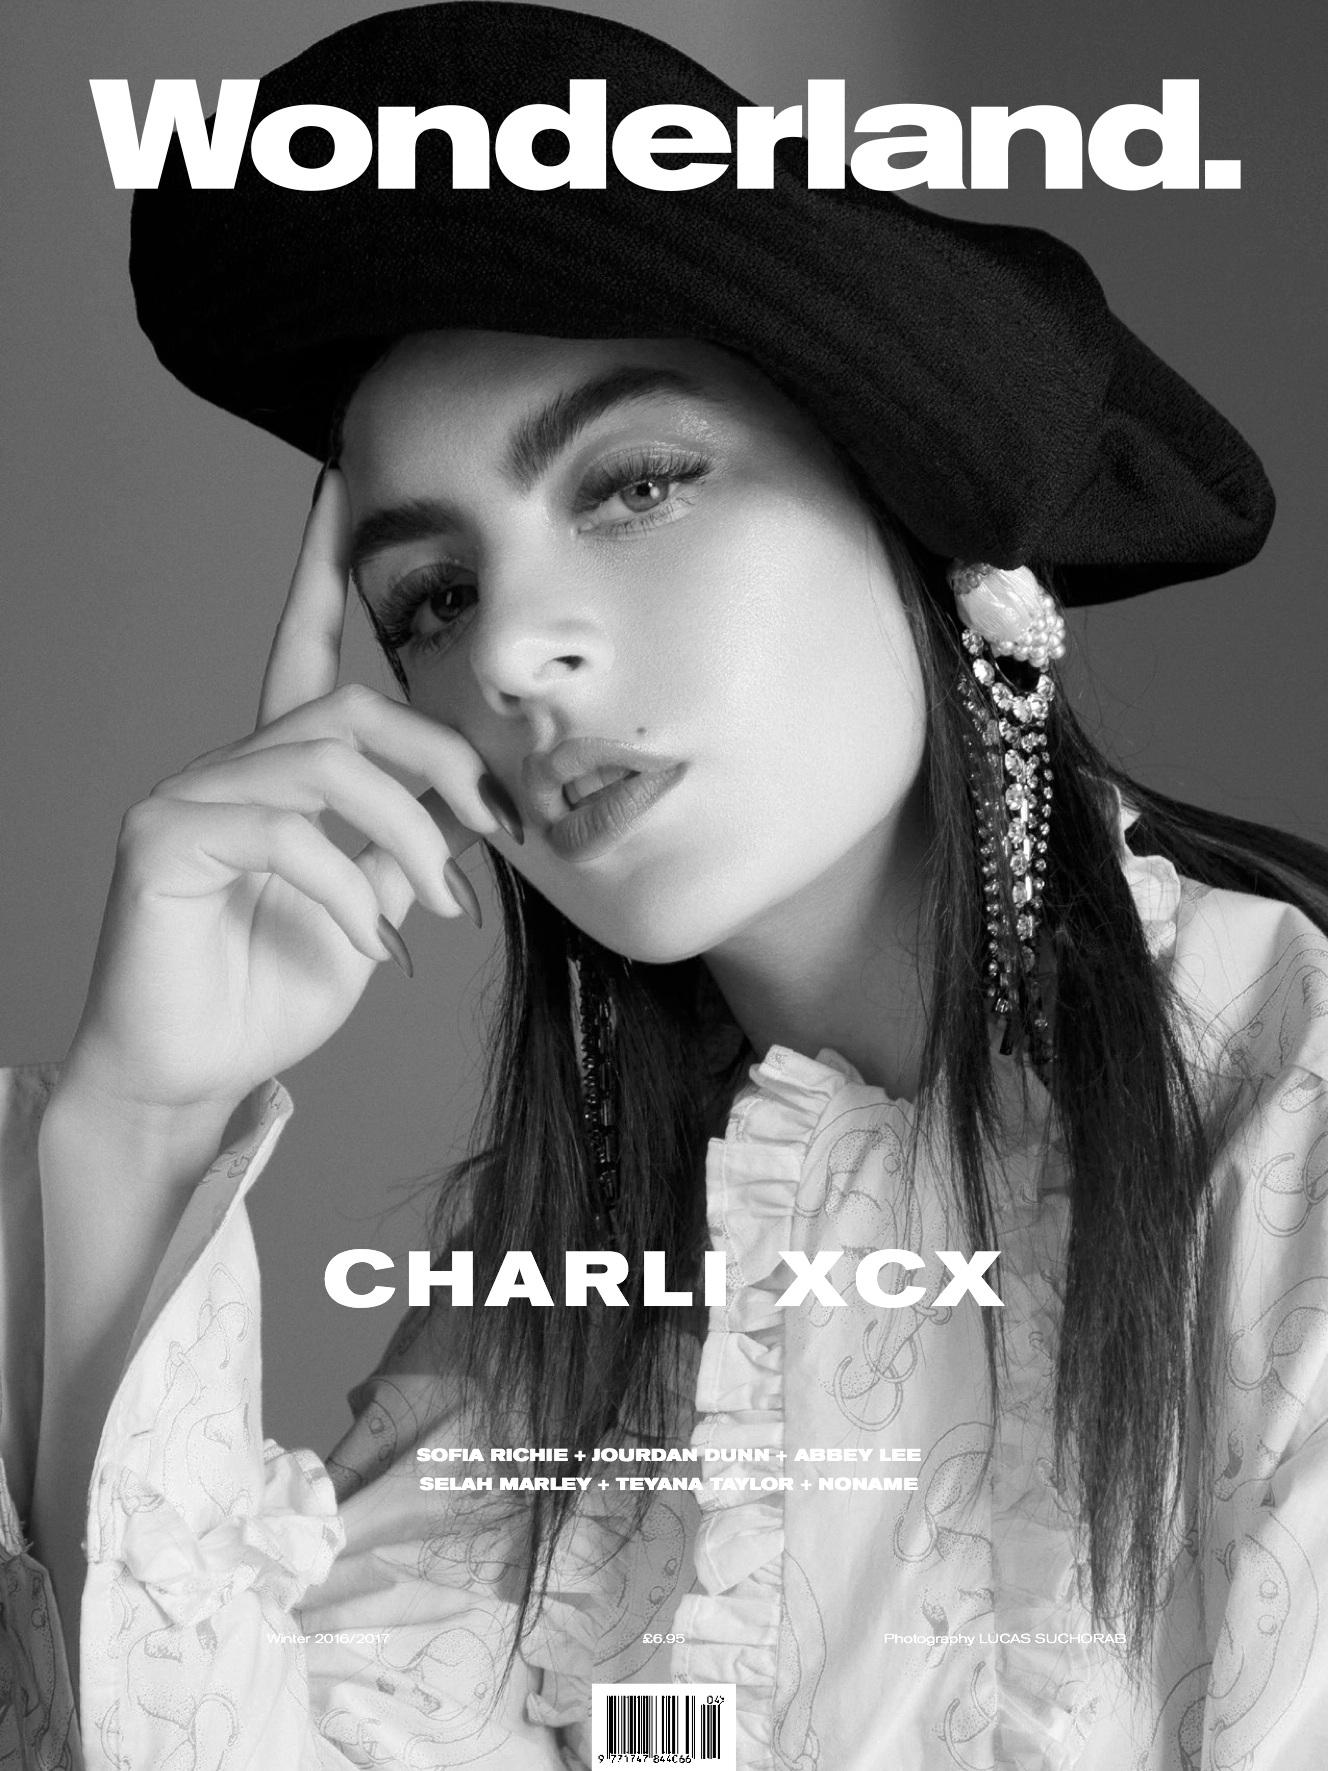 CHARLI-XCX-WONDERLAND-COVER-1-OF-2-WINTER-ISSUE-2016.jpg